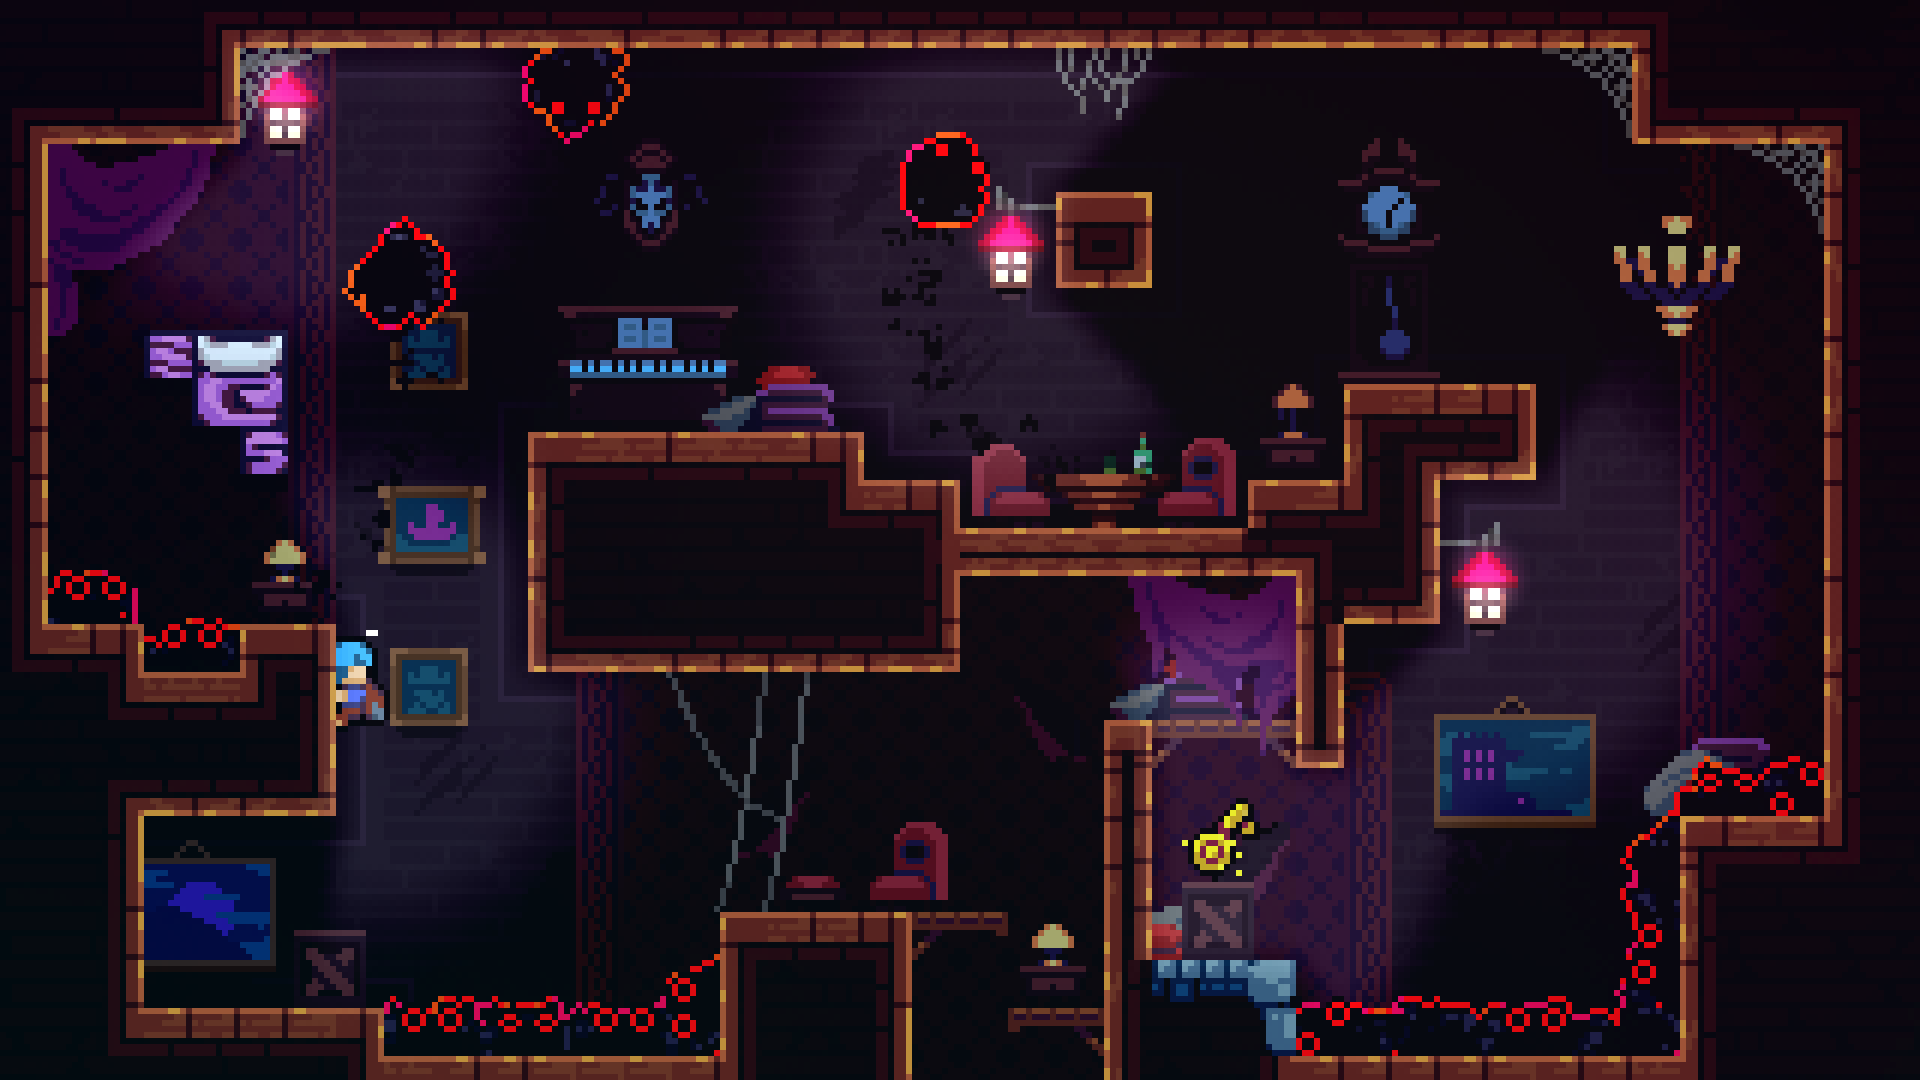 Celeste screenshot